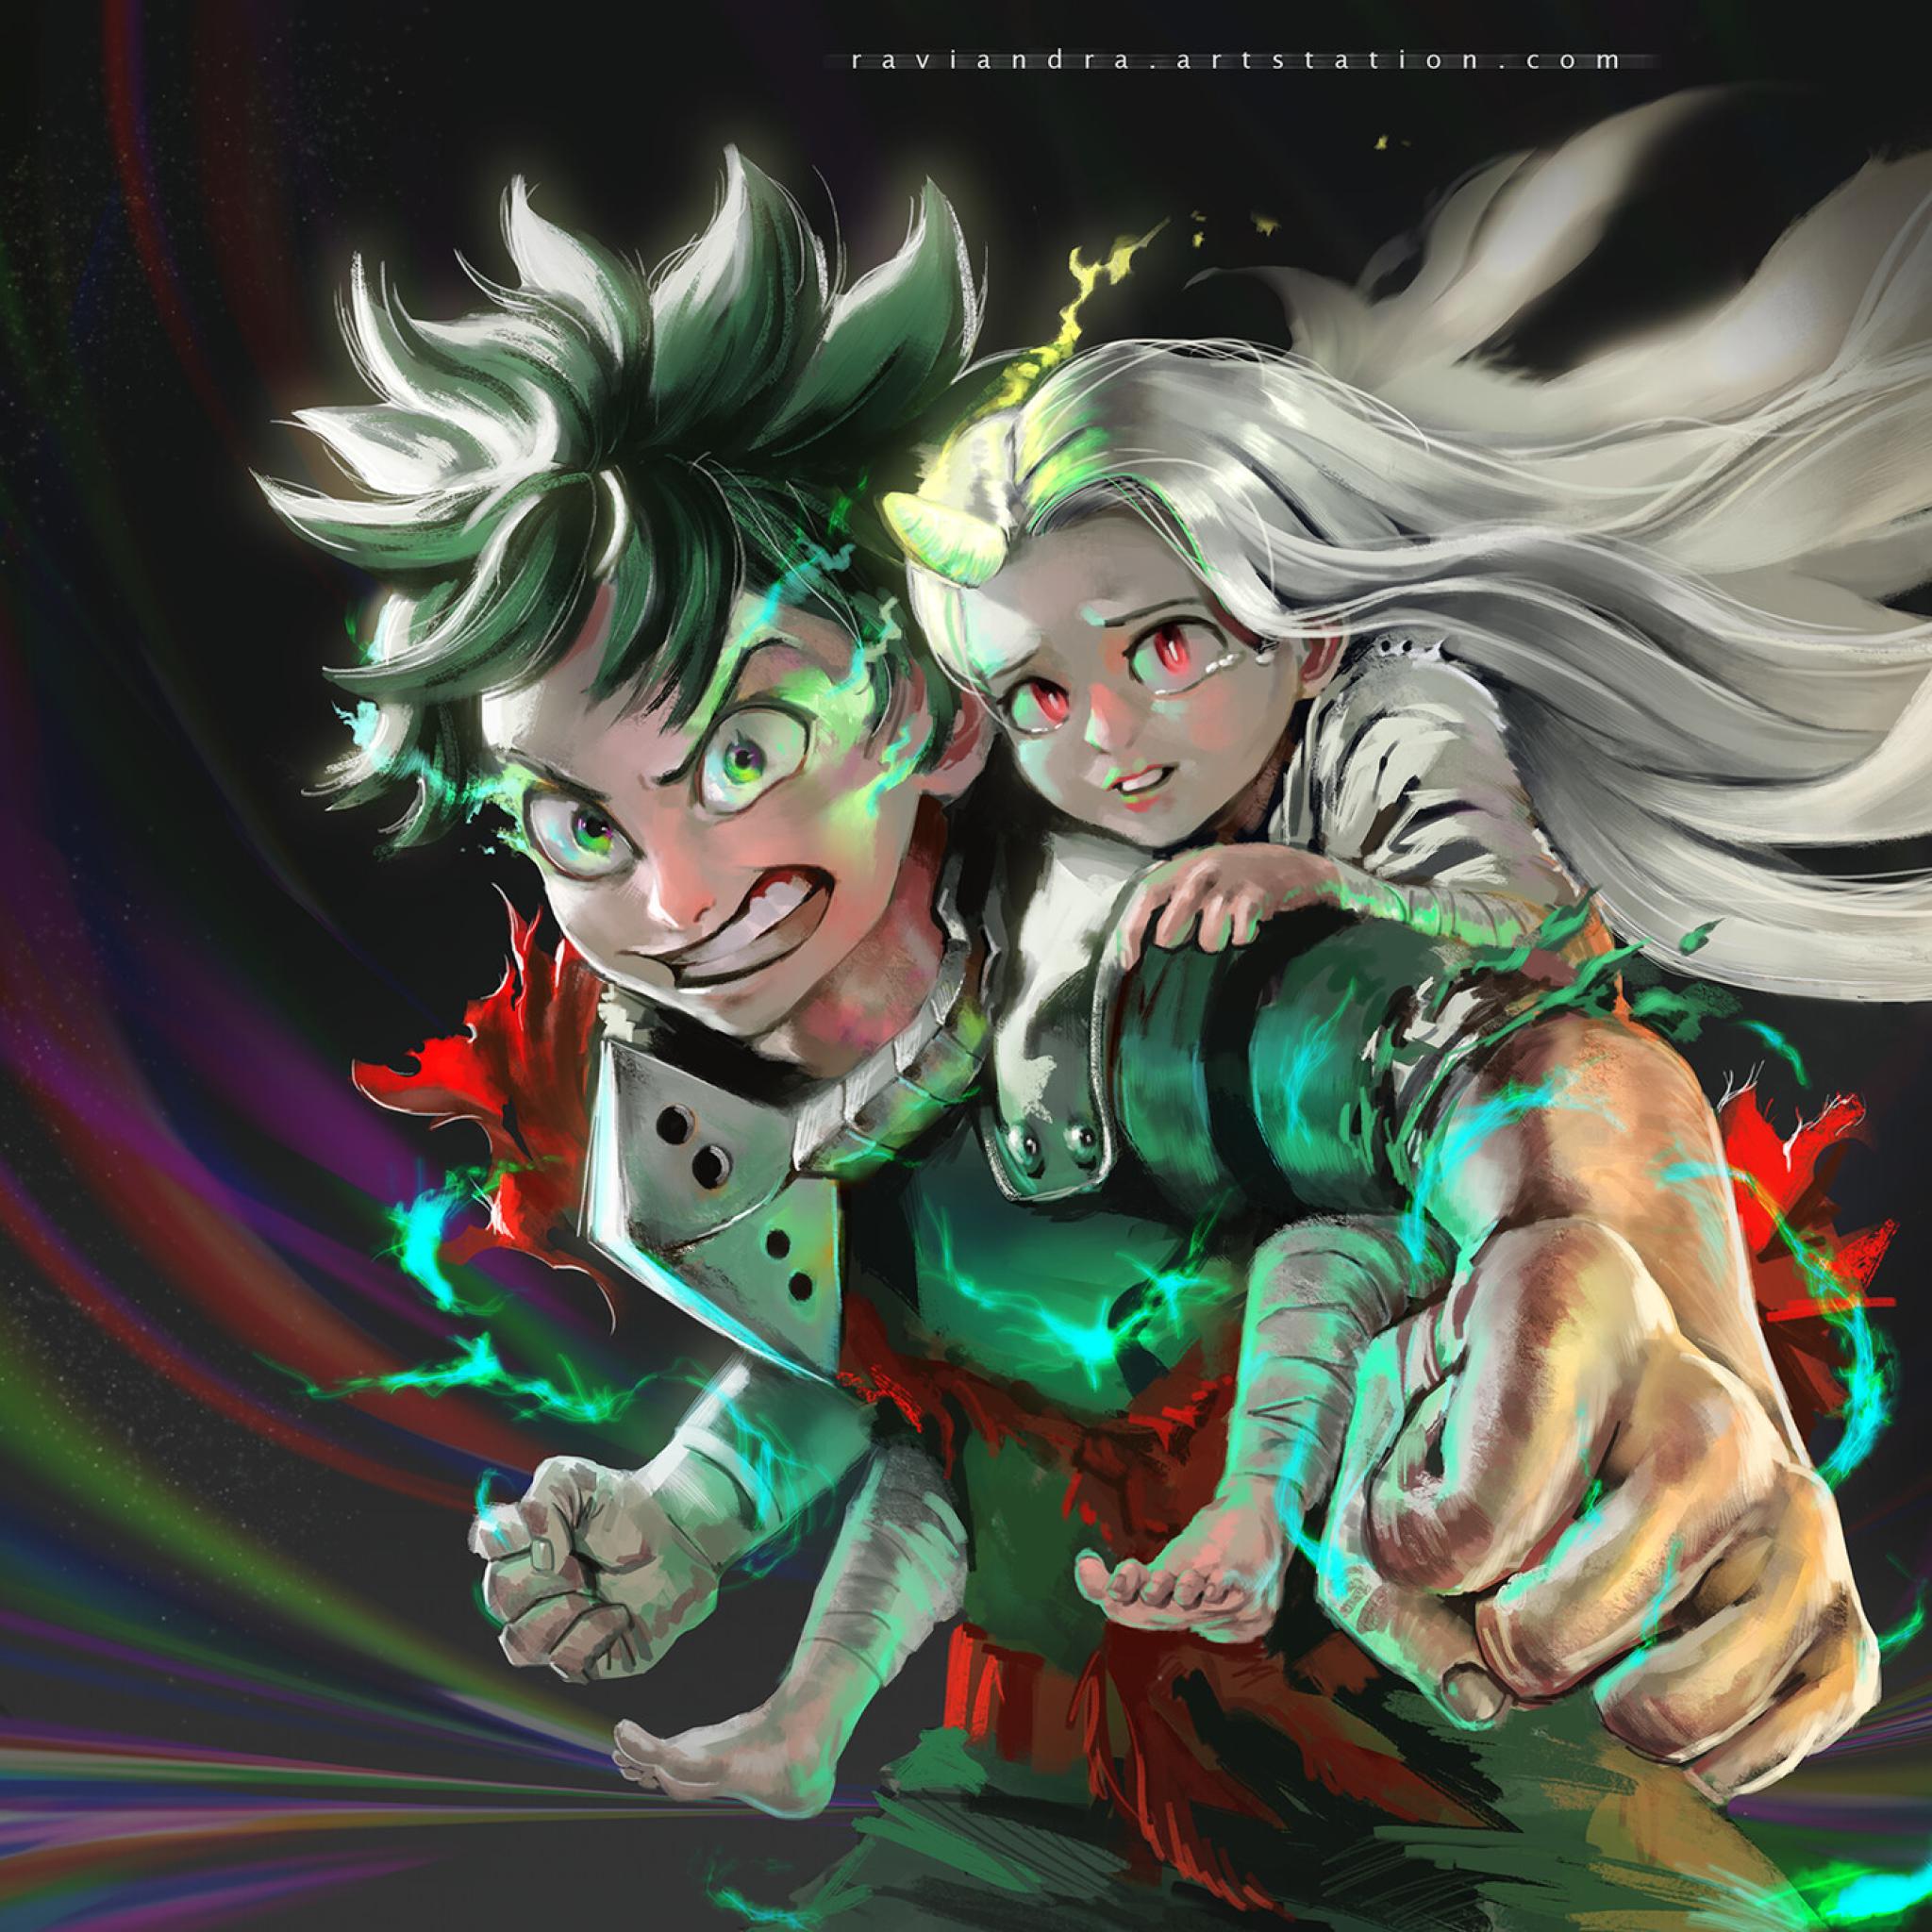 Eri and Izuku Midoriya Wallpaper in 2048x2048 Resolution